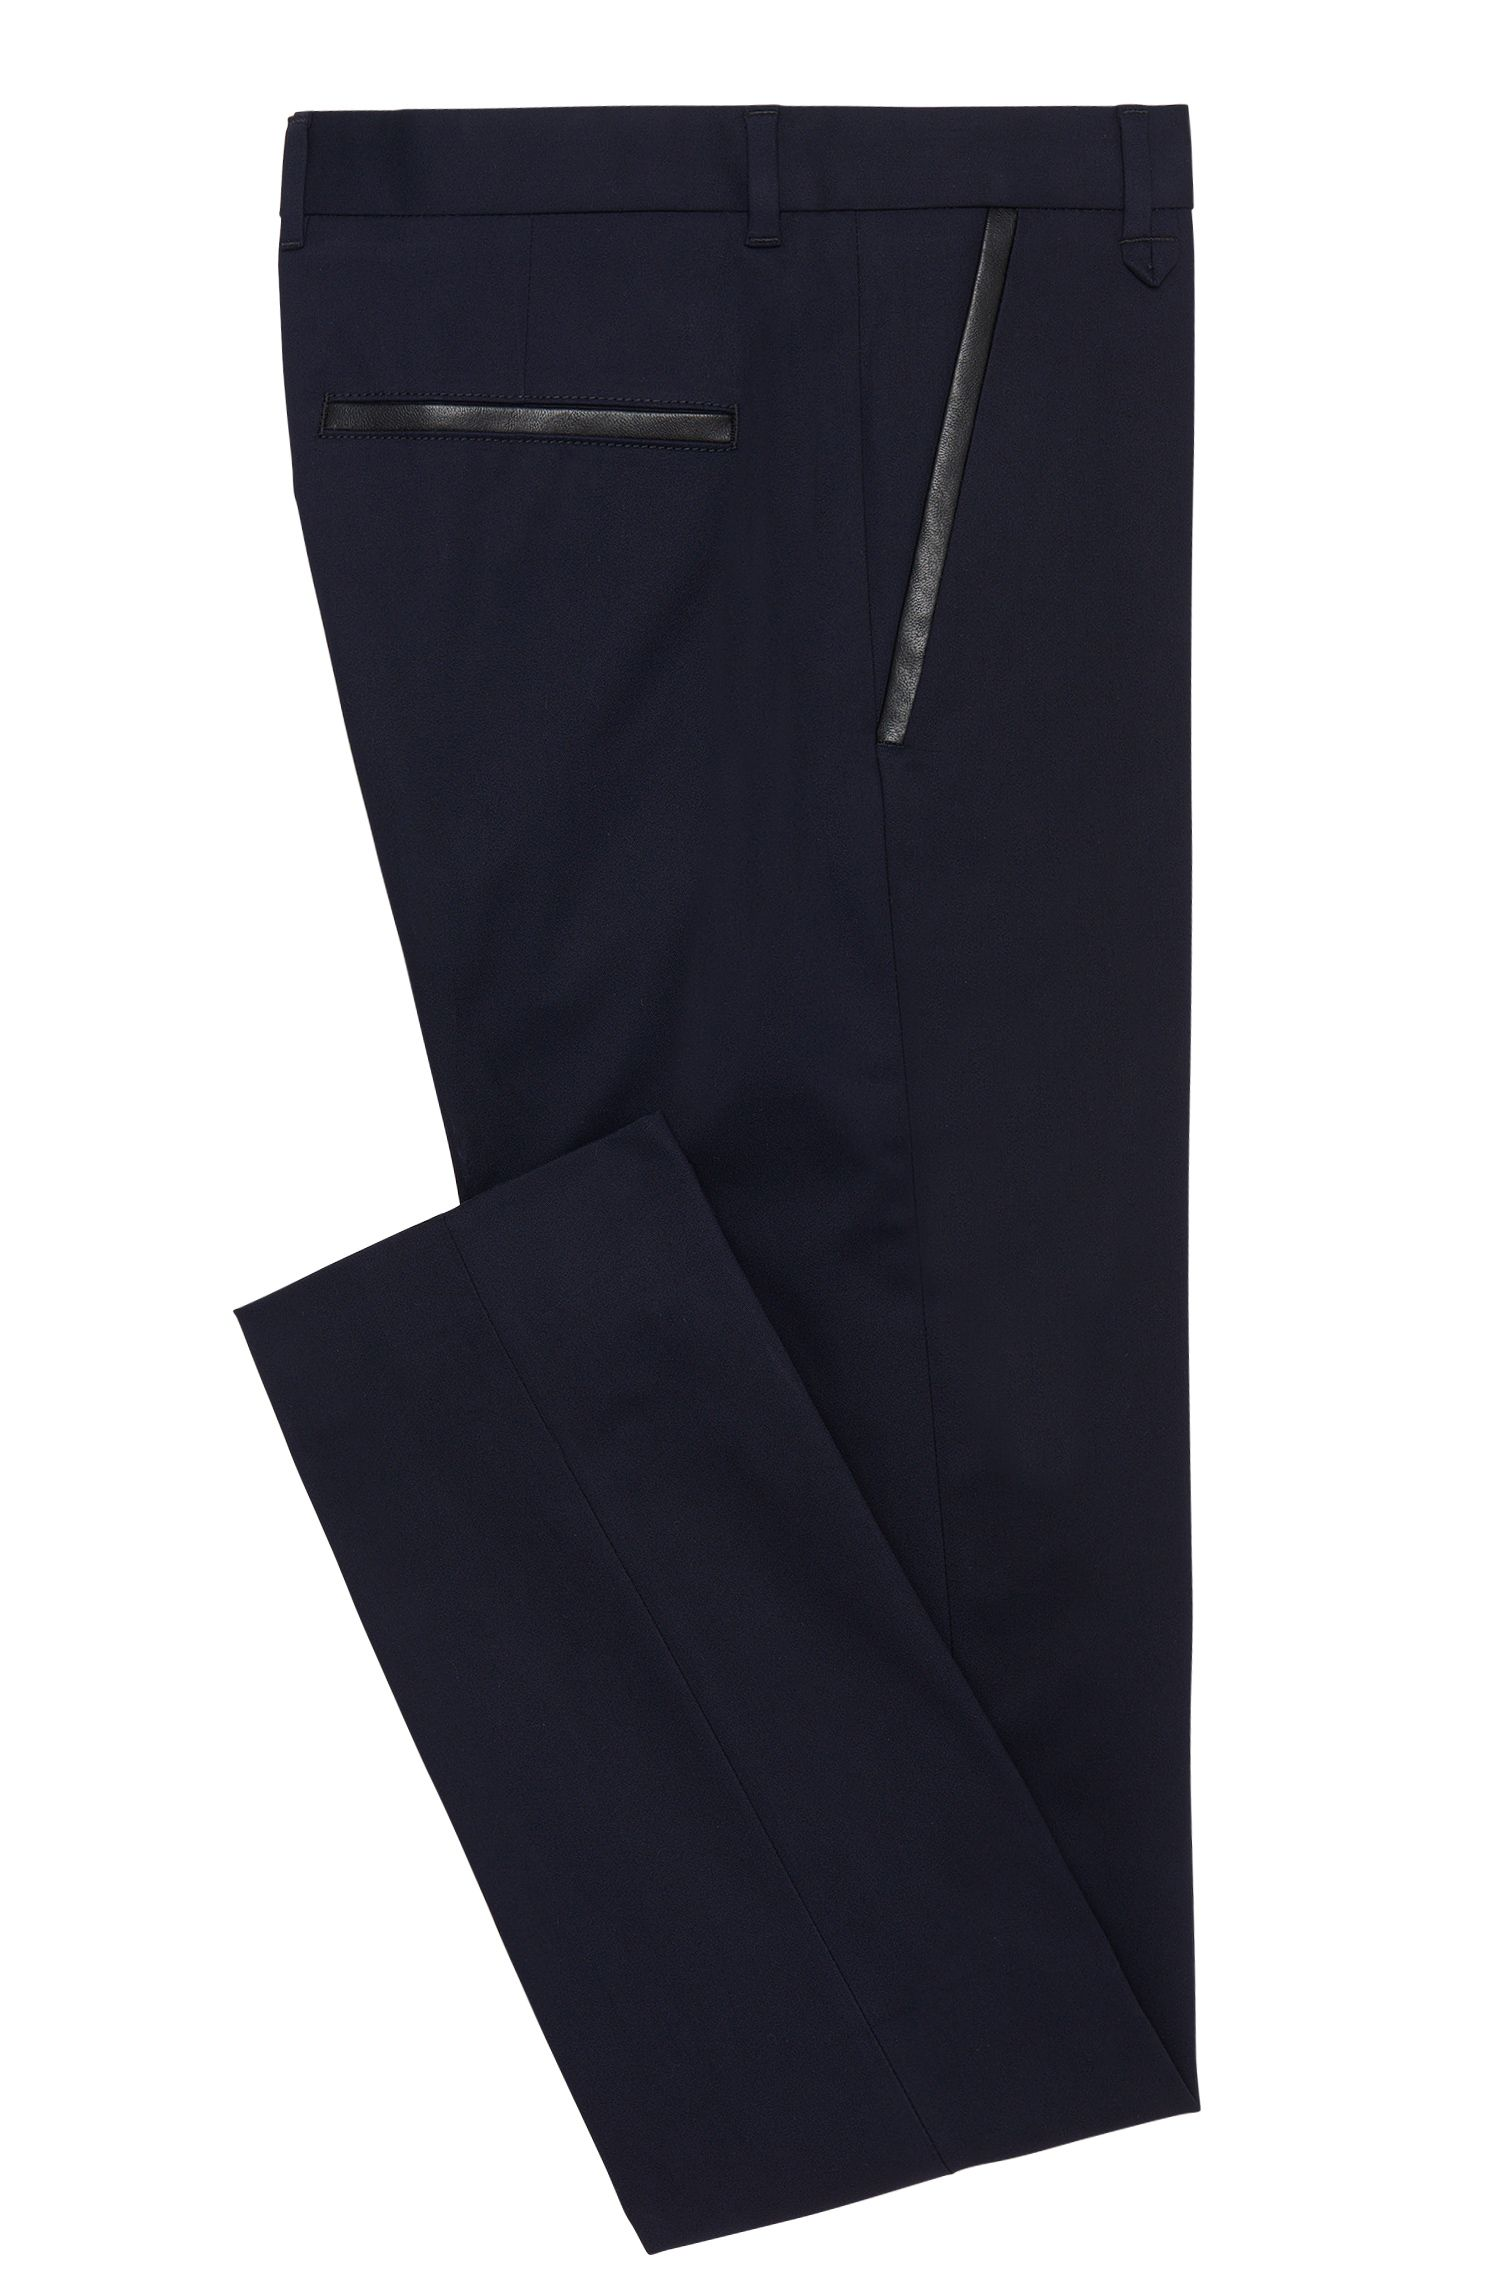 Extra Slim-Fit Hose aus Stretch-Baumwolle mit Details in Leder-Optik: 'Halyk'